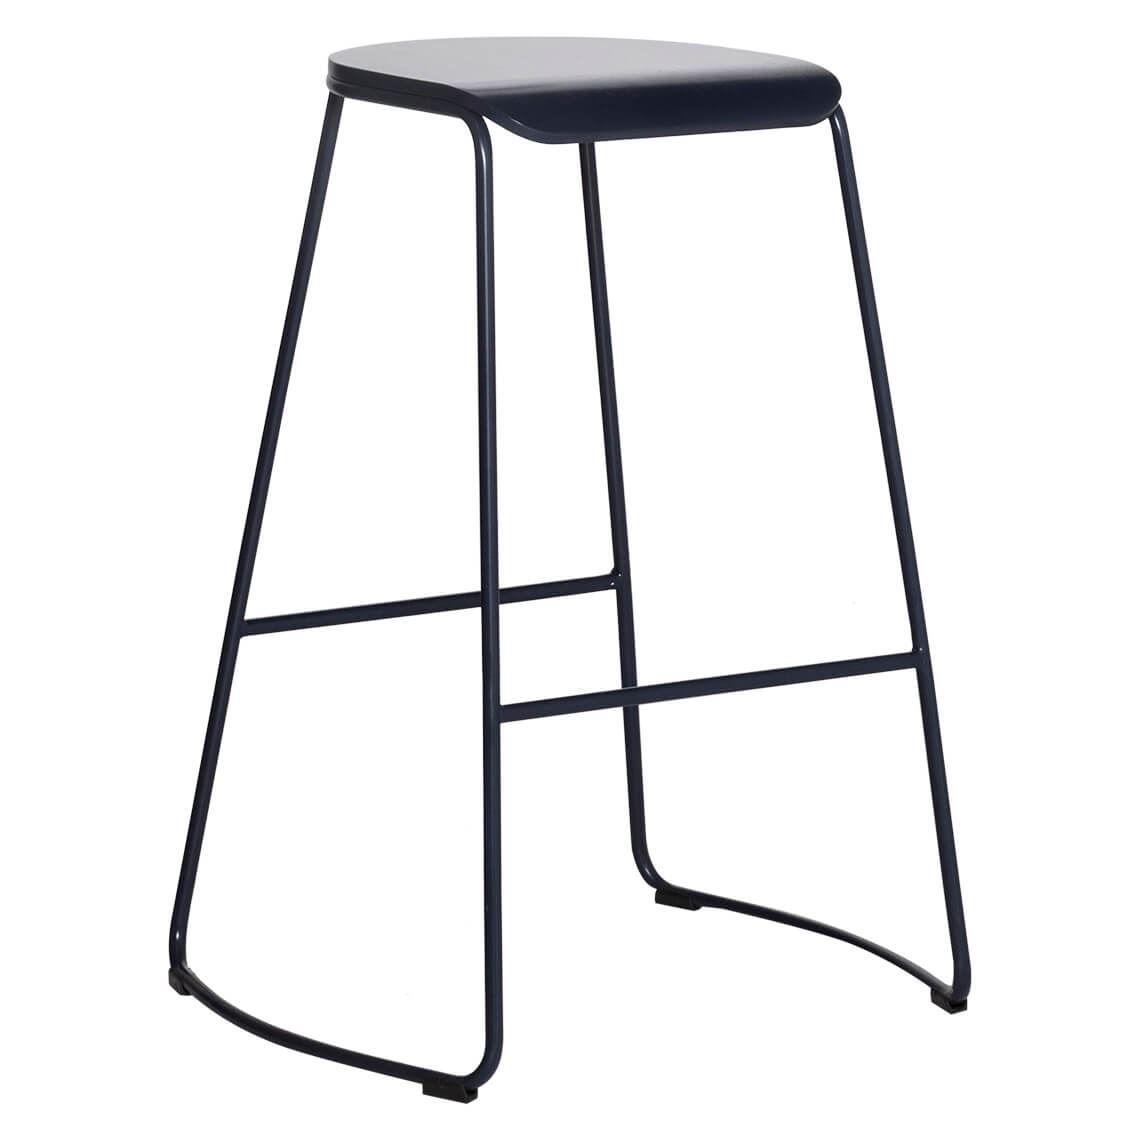 polo bar stool size w 44cm x d 52cm x h 70cm in navy